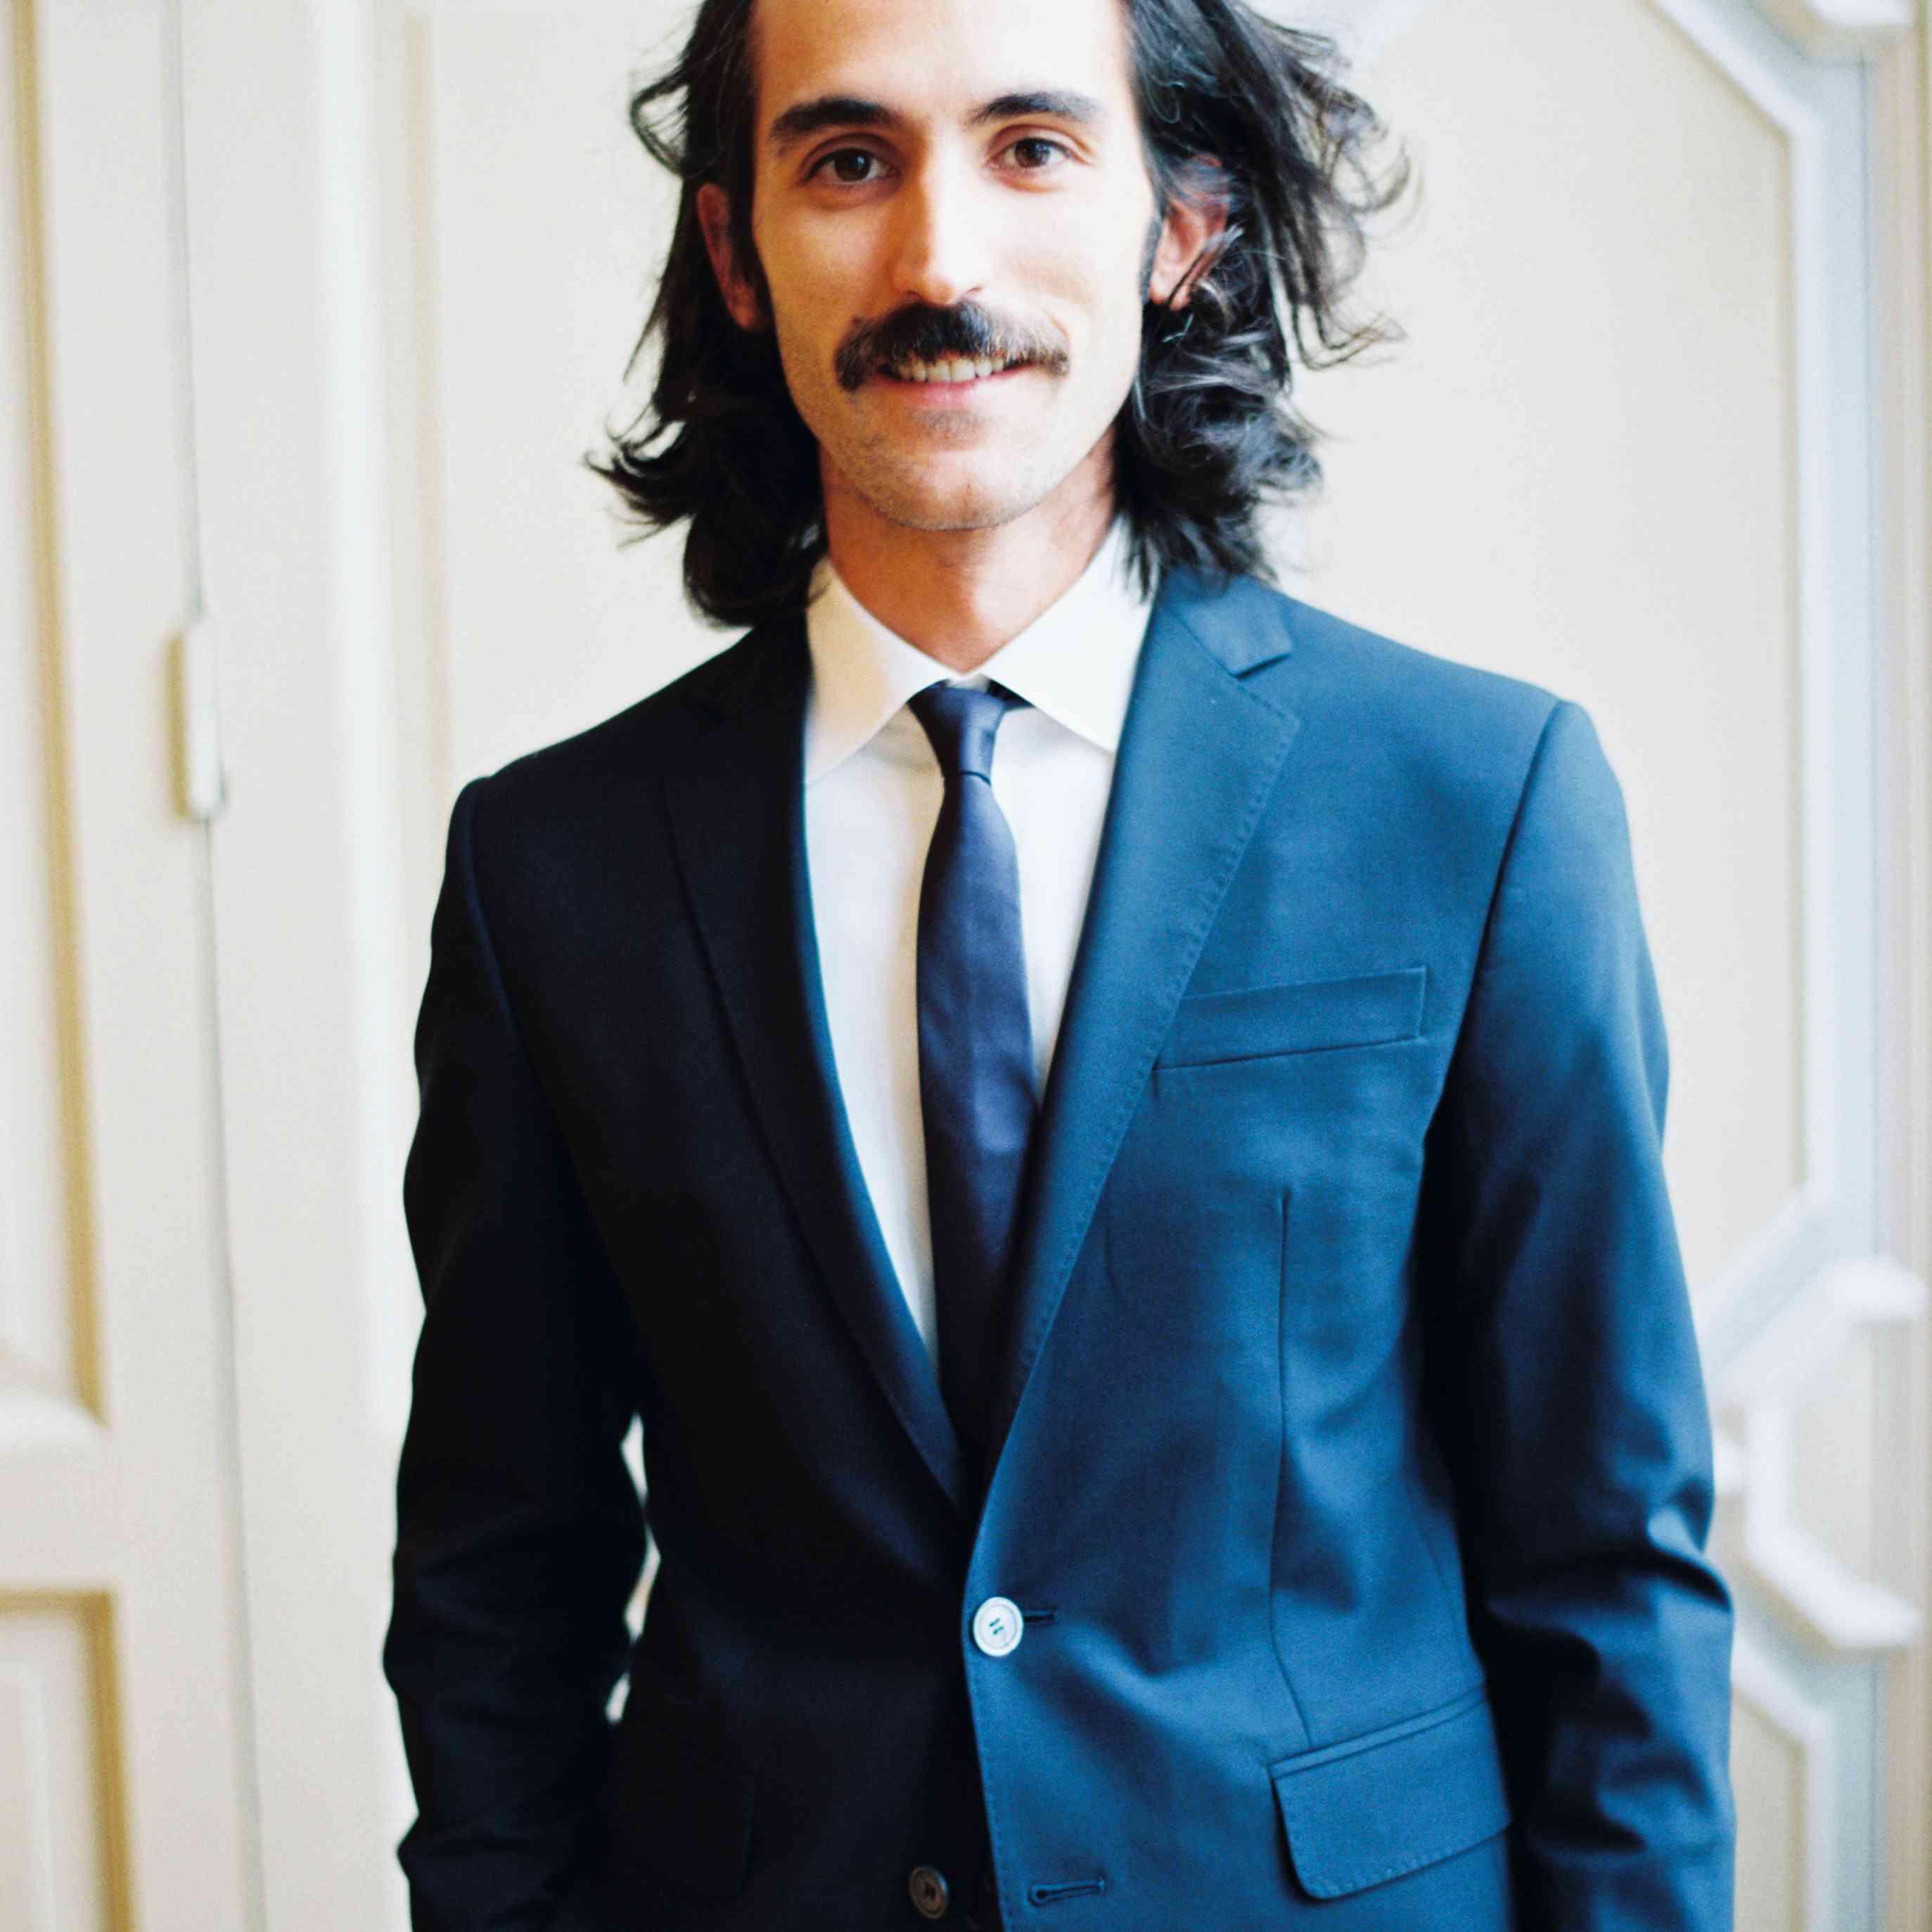 Northern Italian Wedding, Groom in Blue Suit